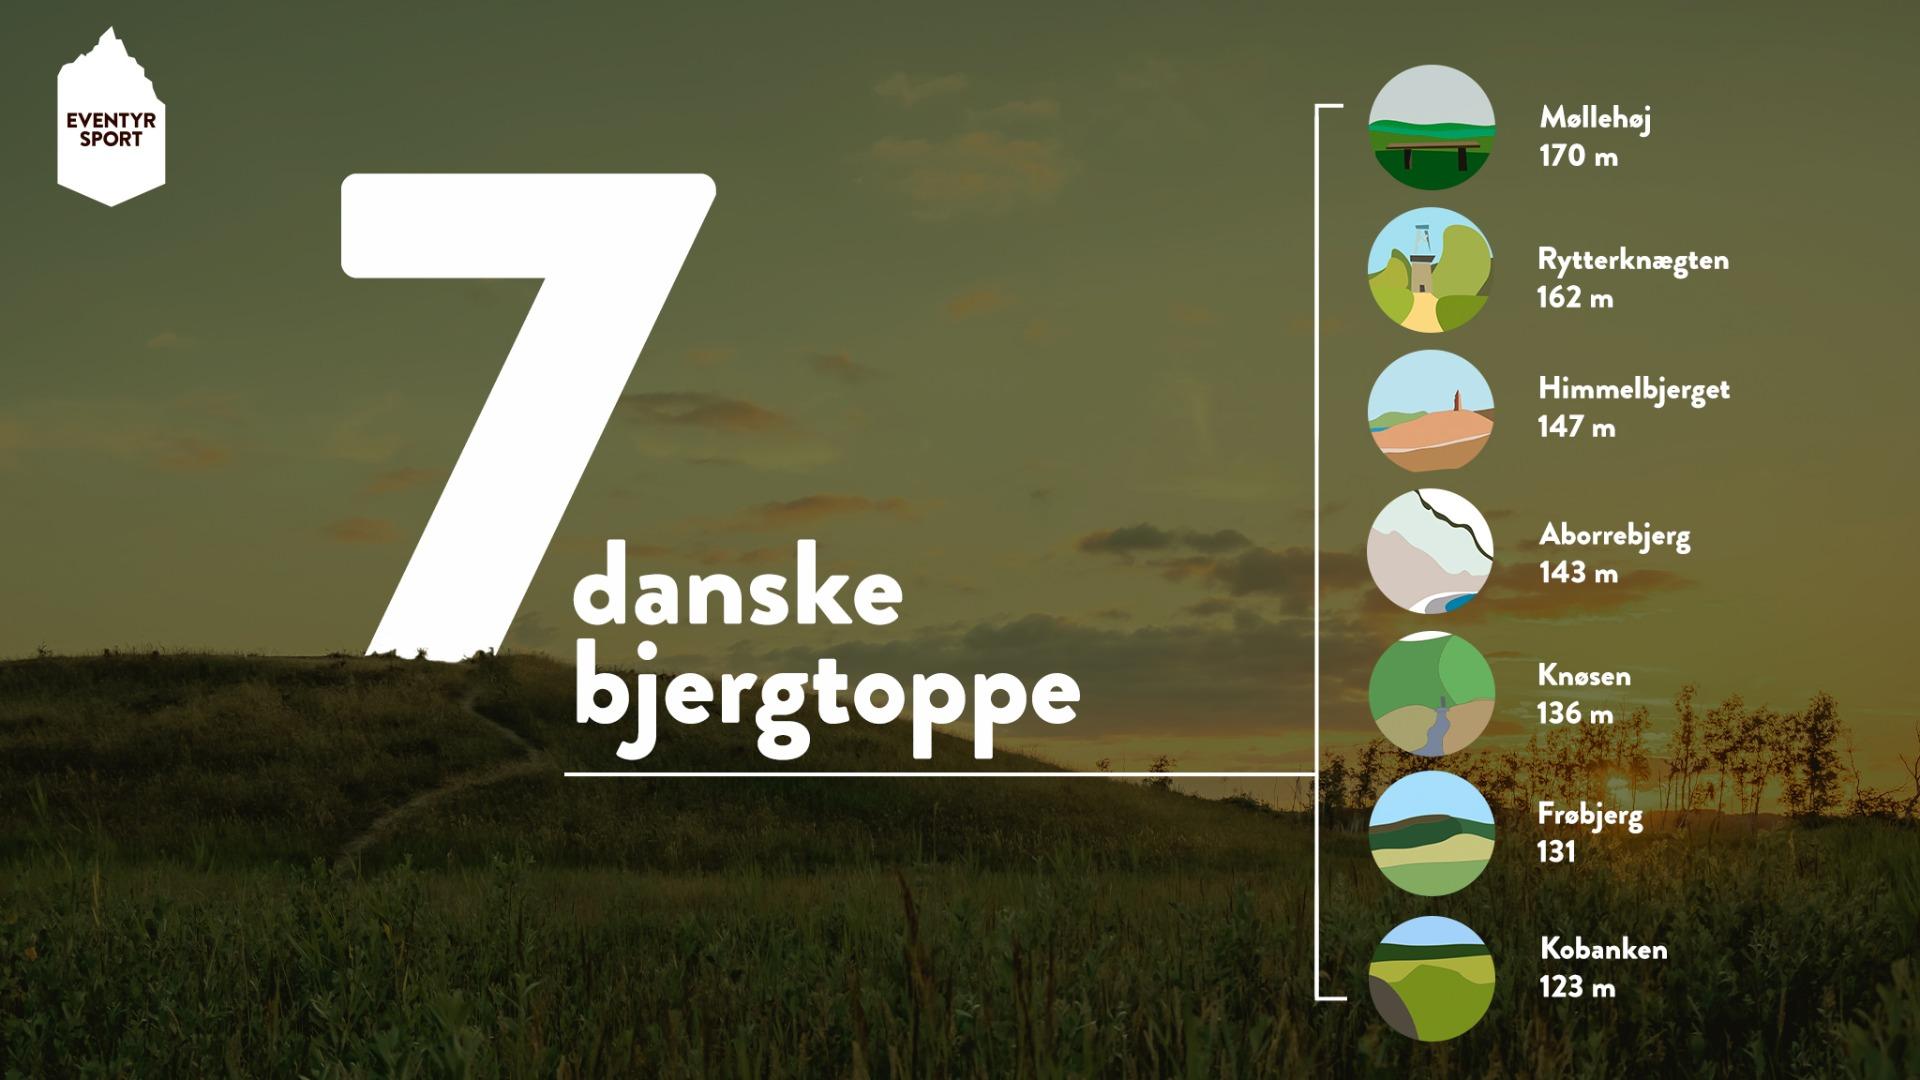 Højeste punkt i danmark - Bestig danmarks bjerge